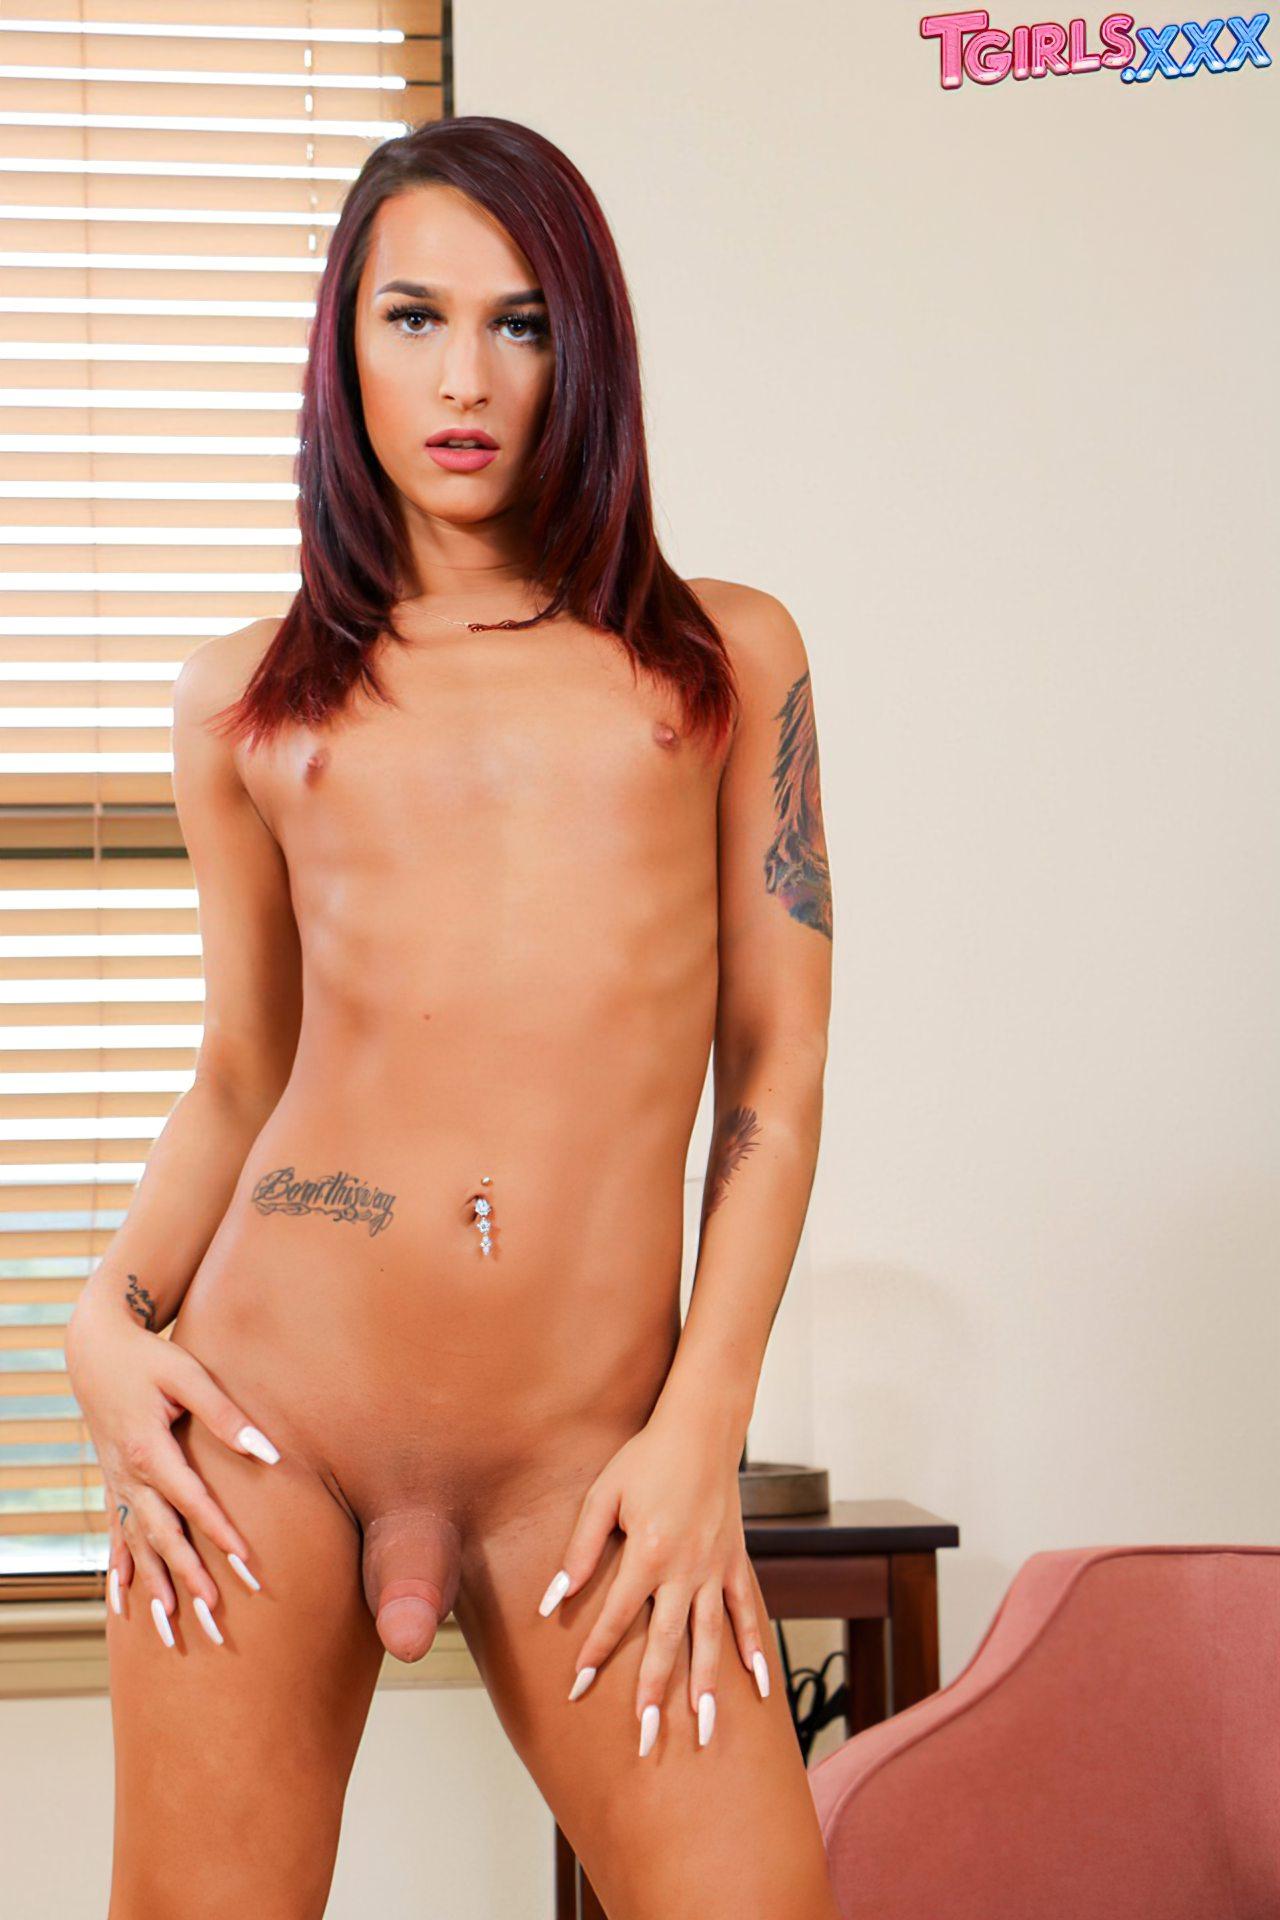 Travestis Imgs (43)